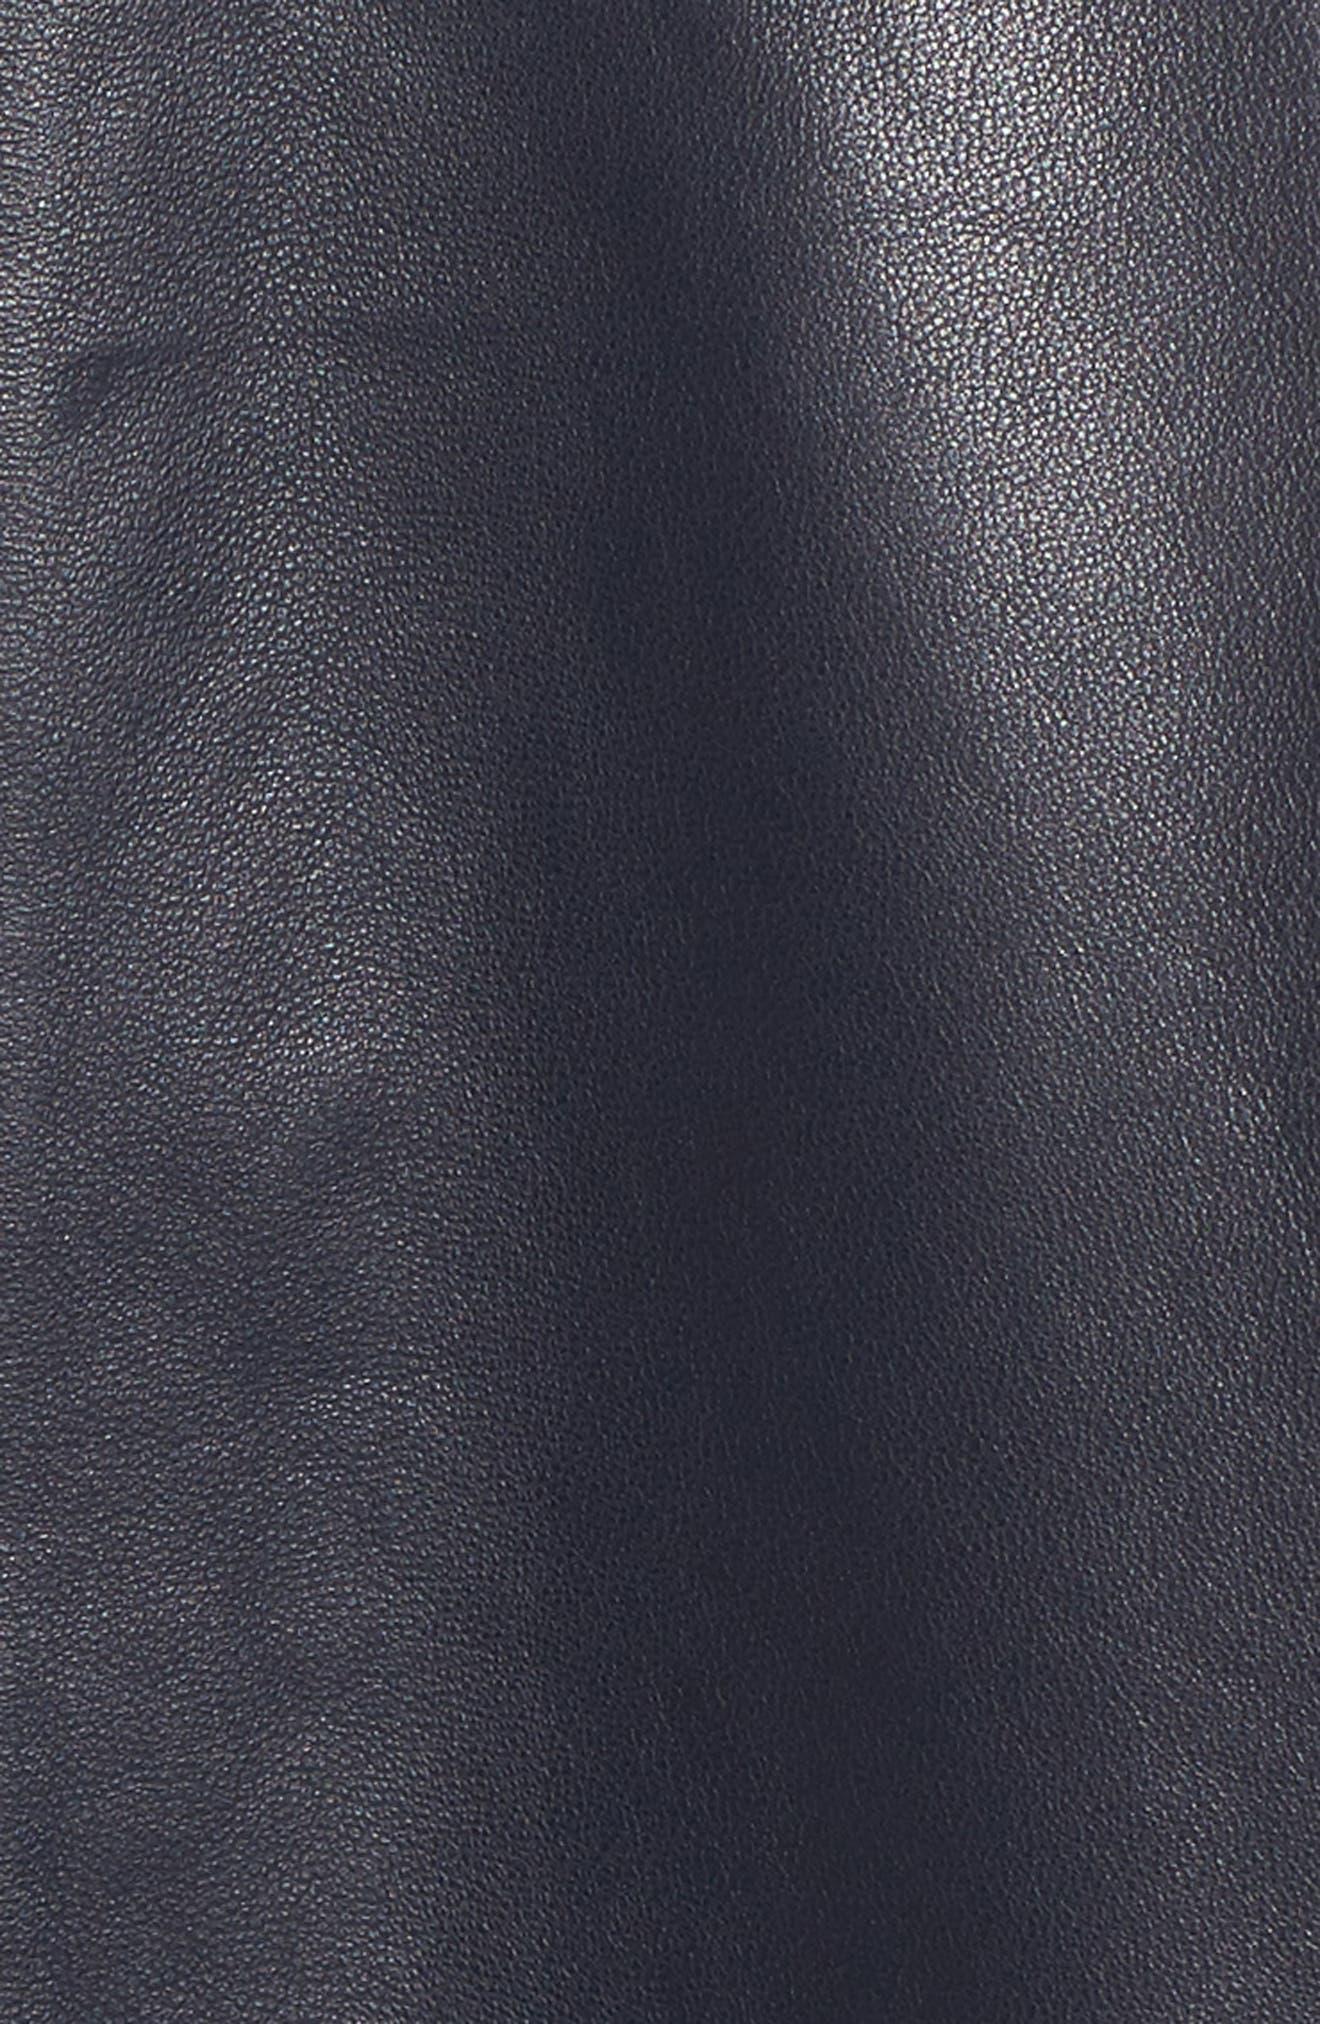 Ruffle Back Leather Jacket,                             Alternate thumbnail 5, color,                             Navy Night